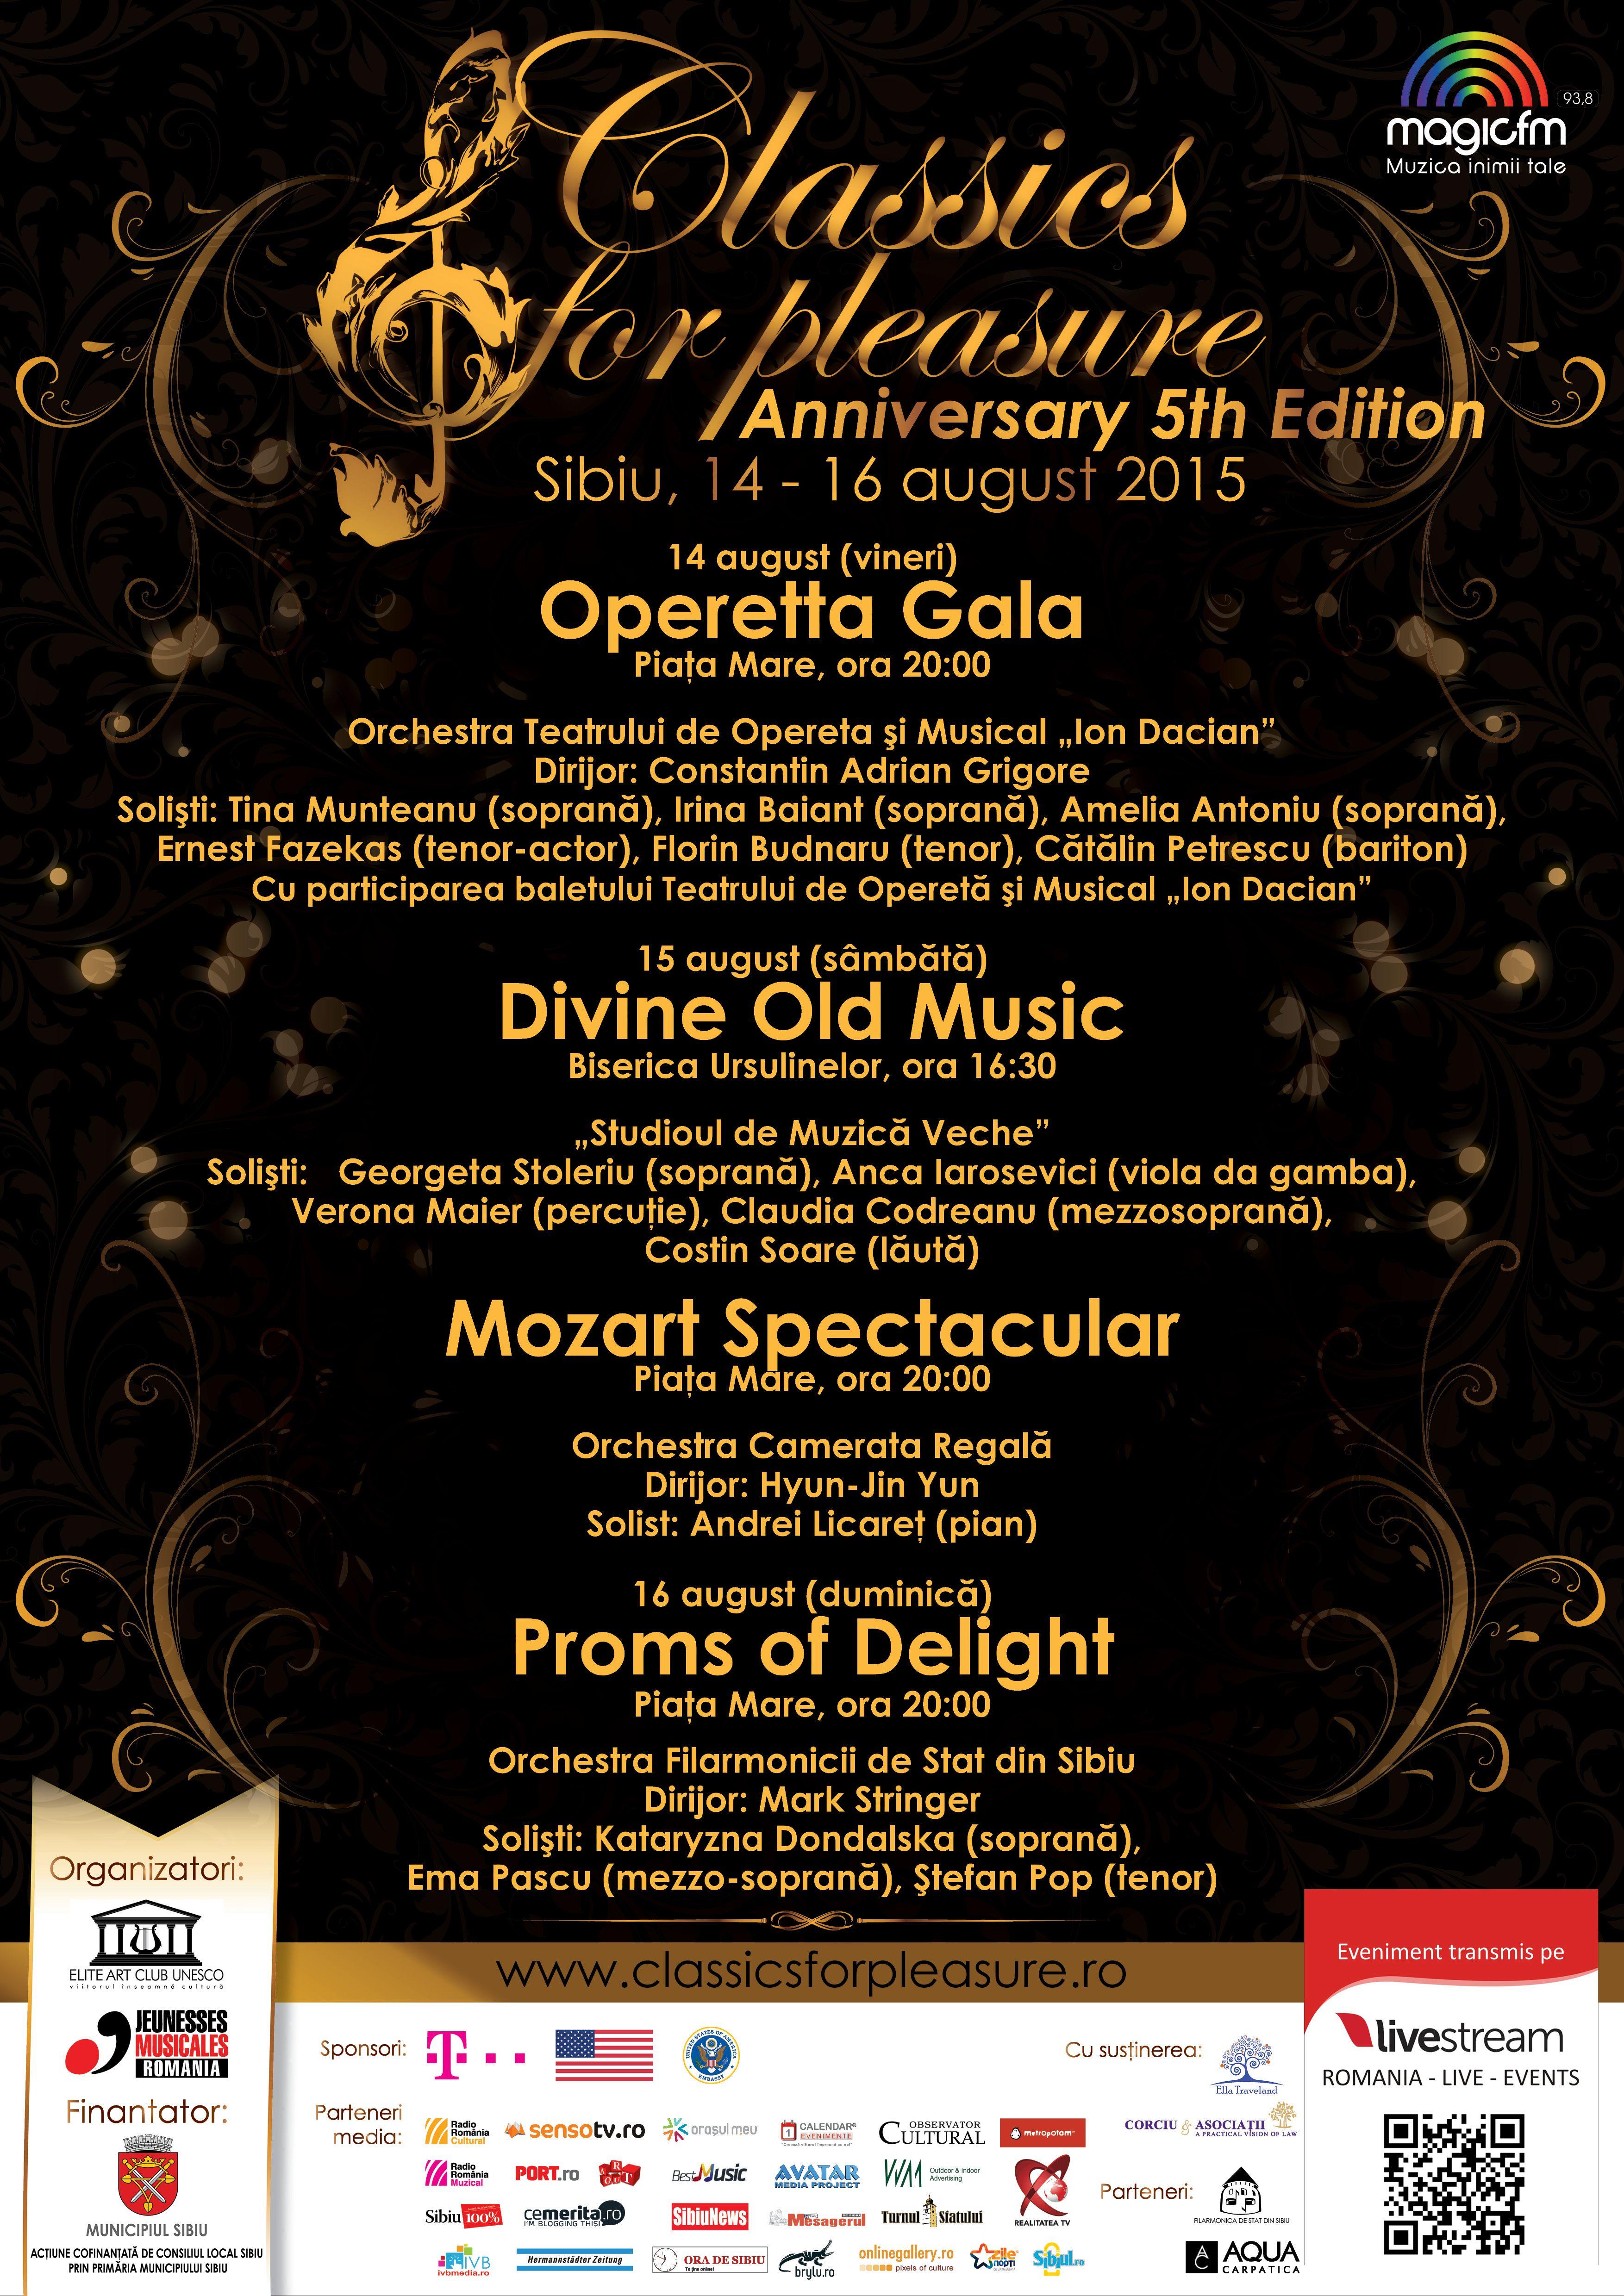 Classics for Pleasure - Anniversary 5th Edition  Sibiu, 14-16 August 2015